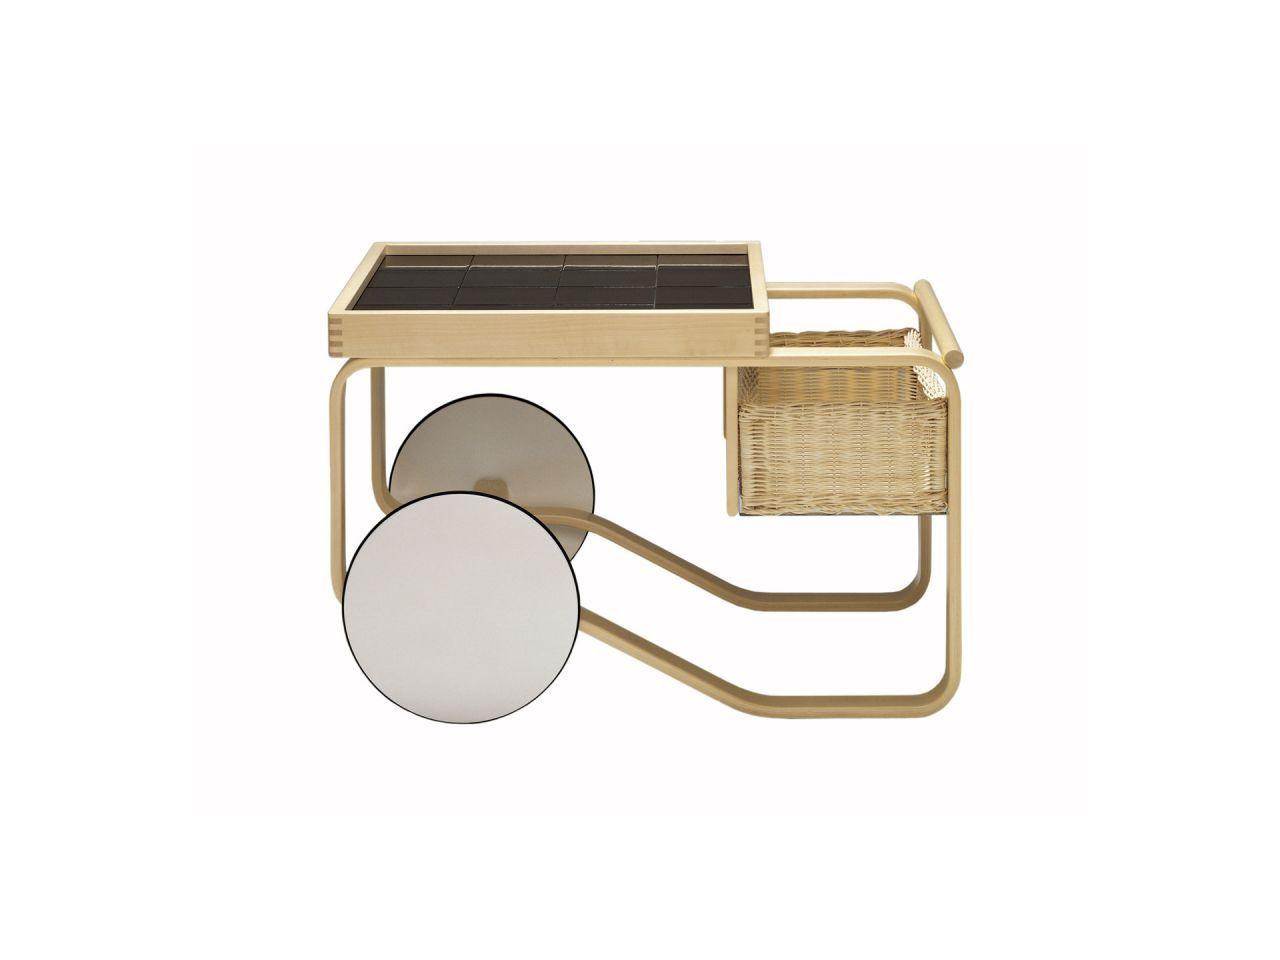 Buffet Table  Designer: Alvar Aalto   Year: 1937